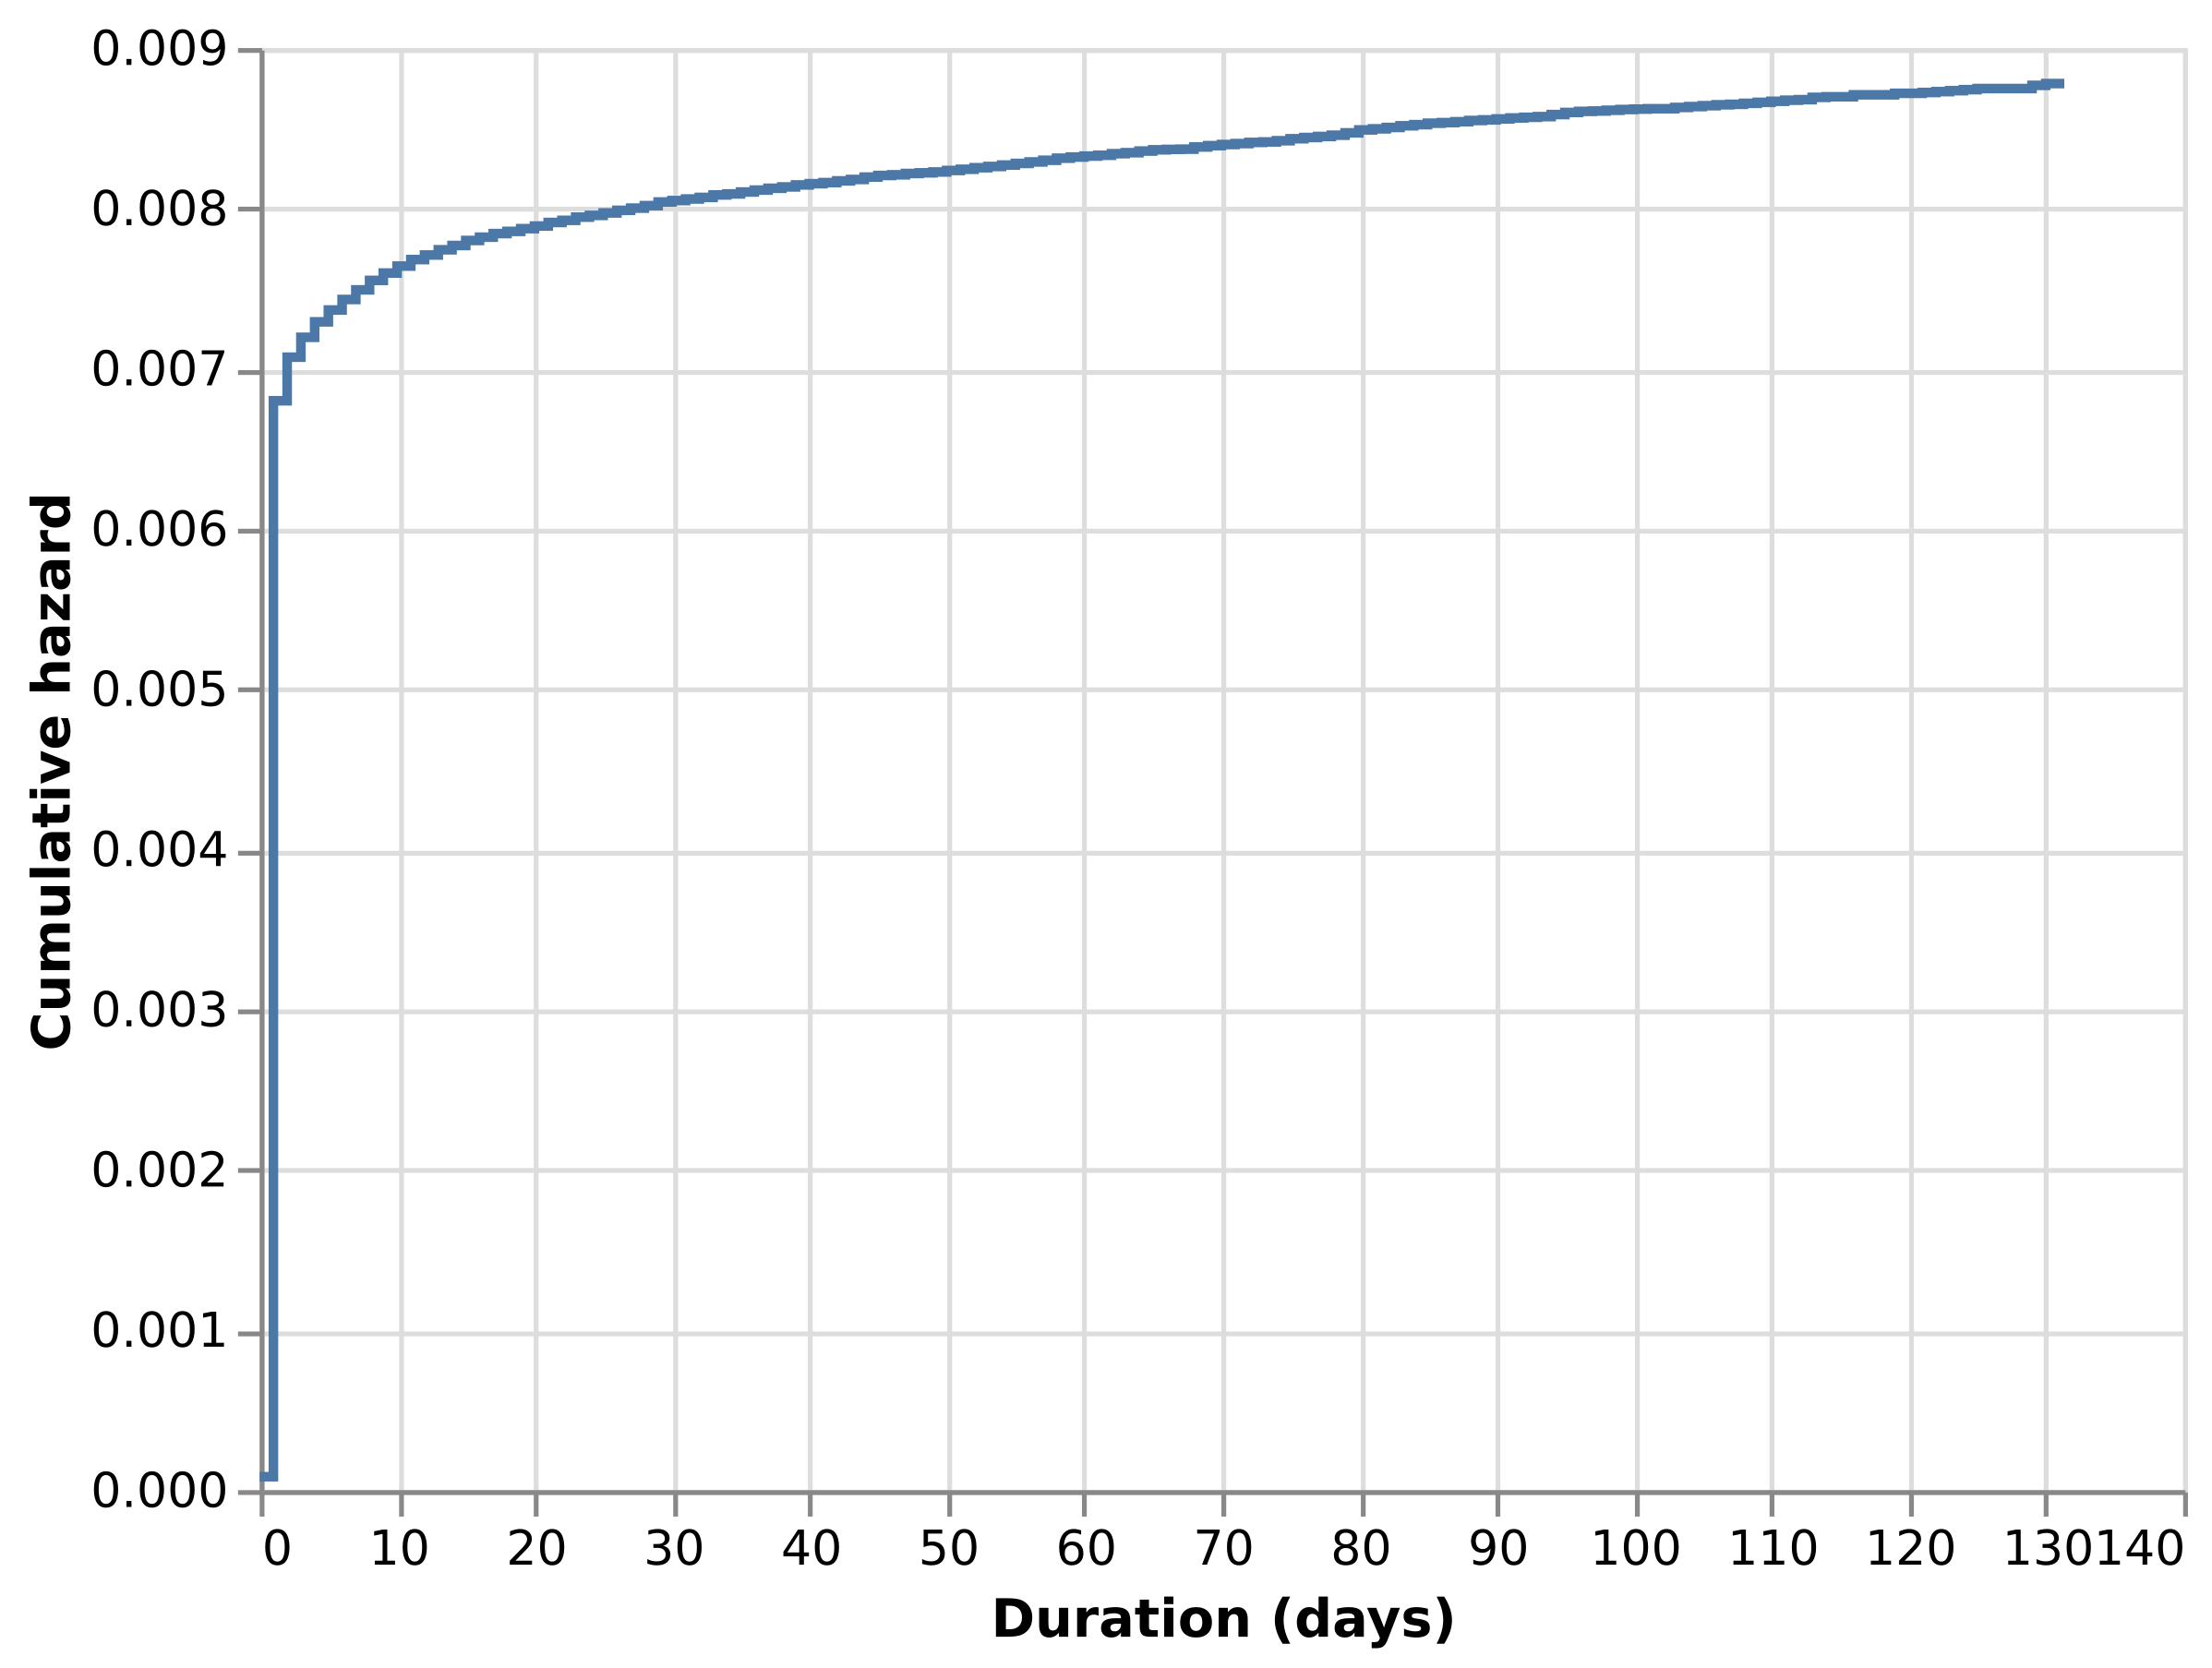 Cumulative hazard estimate for Retail Rocket data